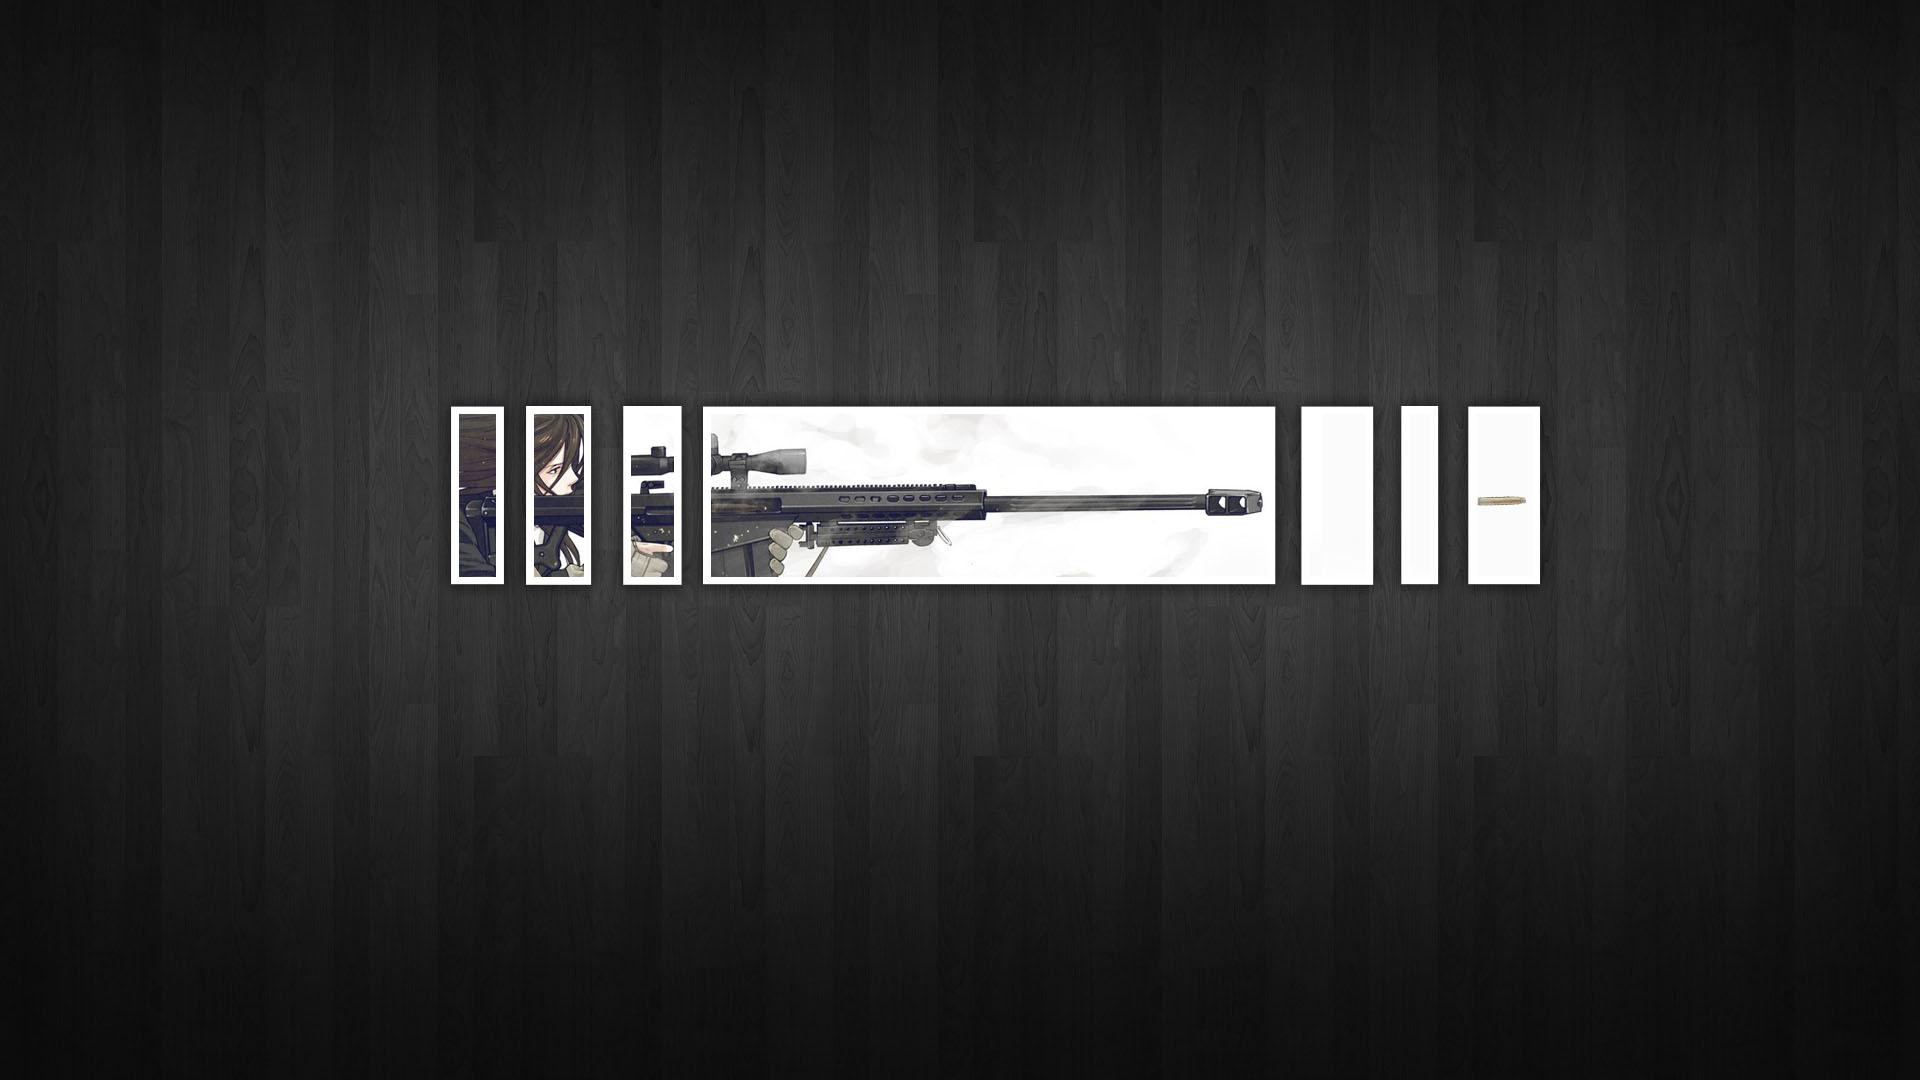 Minimalistic Snipers Gunslinger Girl Simplistic Wooden Floor